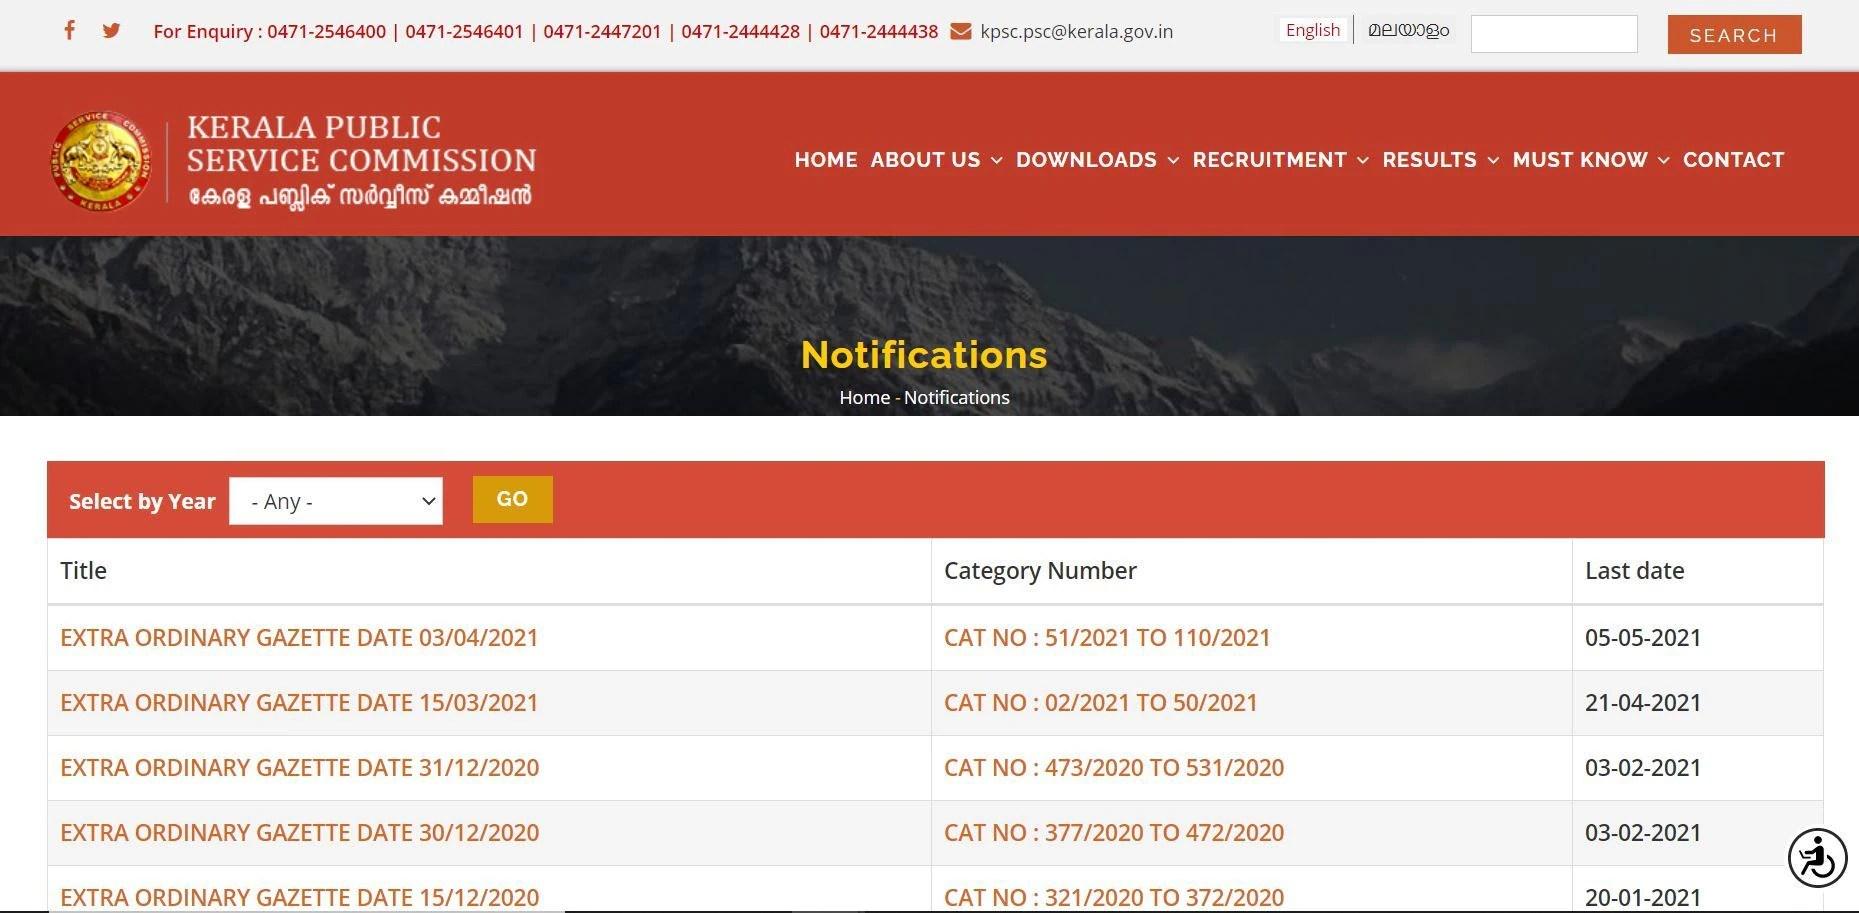 Kerala Public Service Commission Notifies 60 Vacancies, Check Details